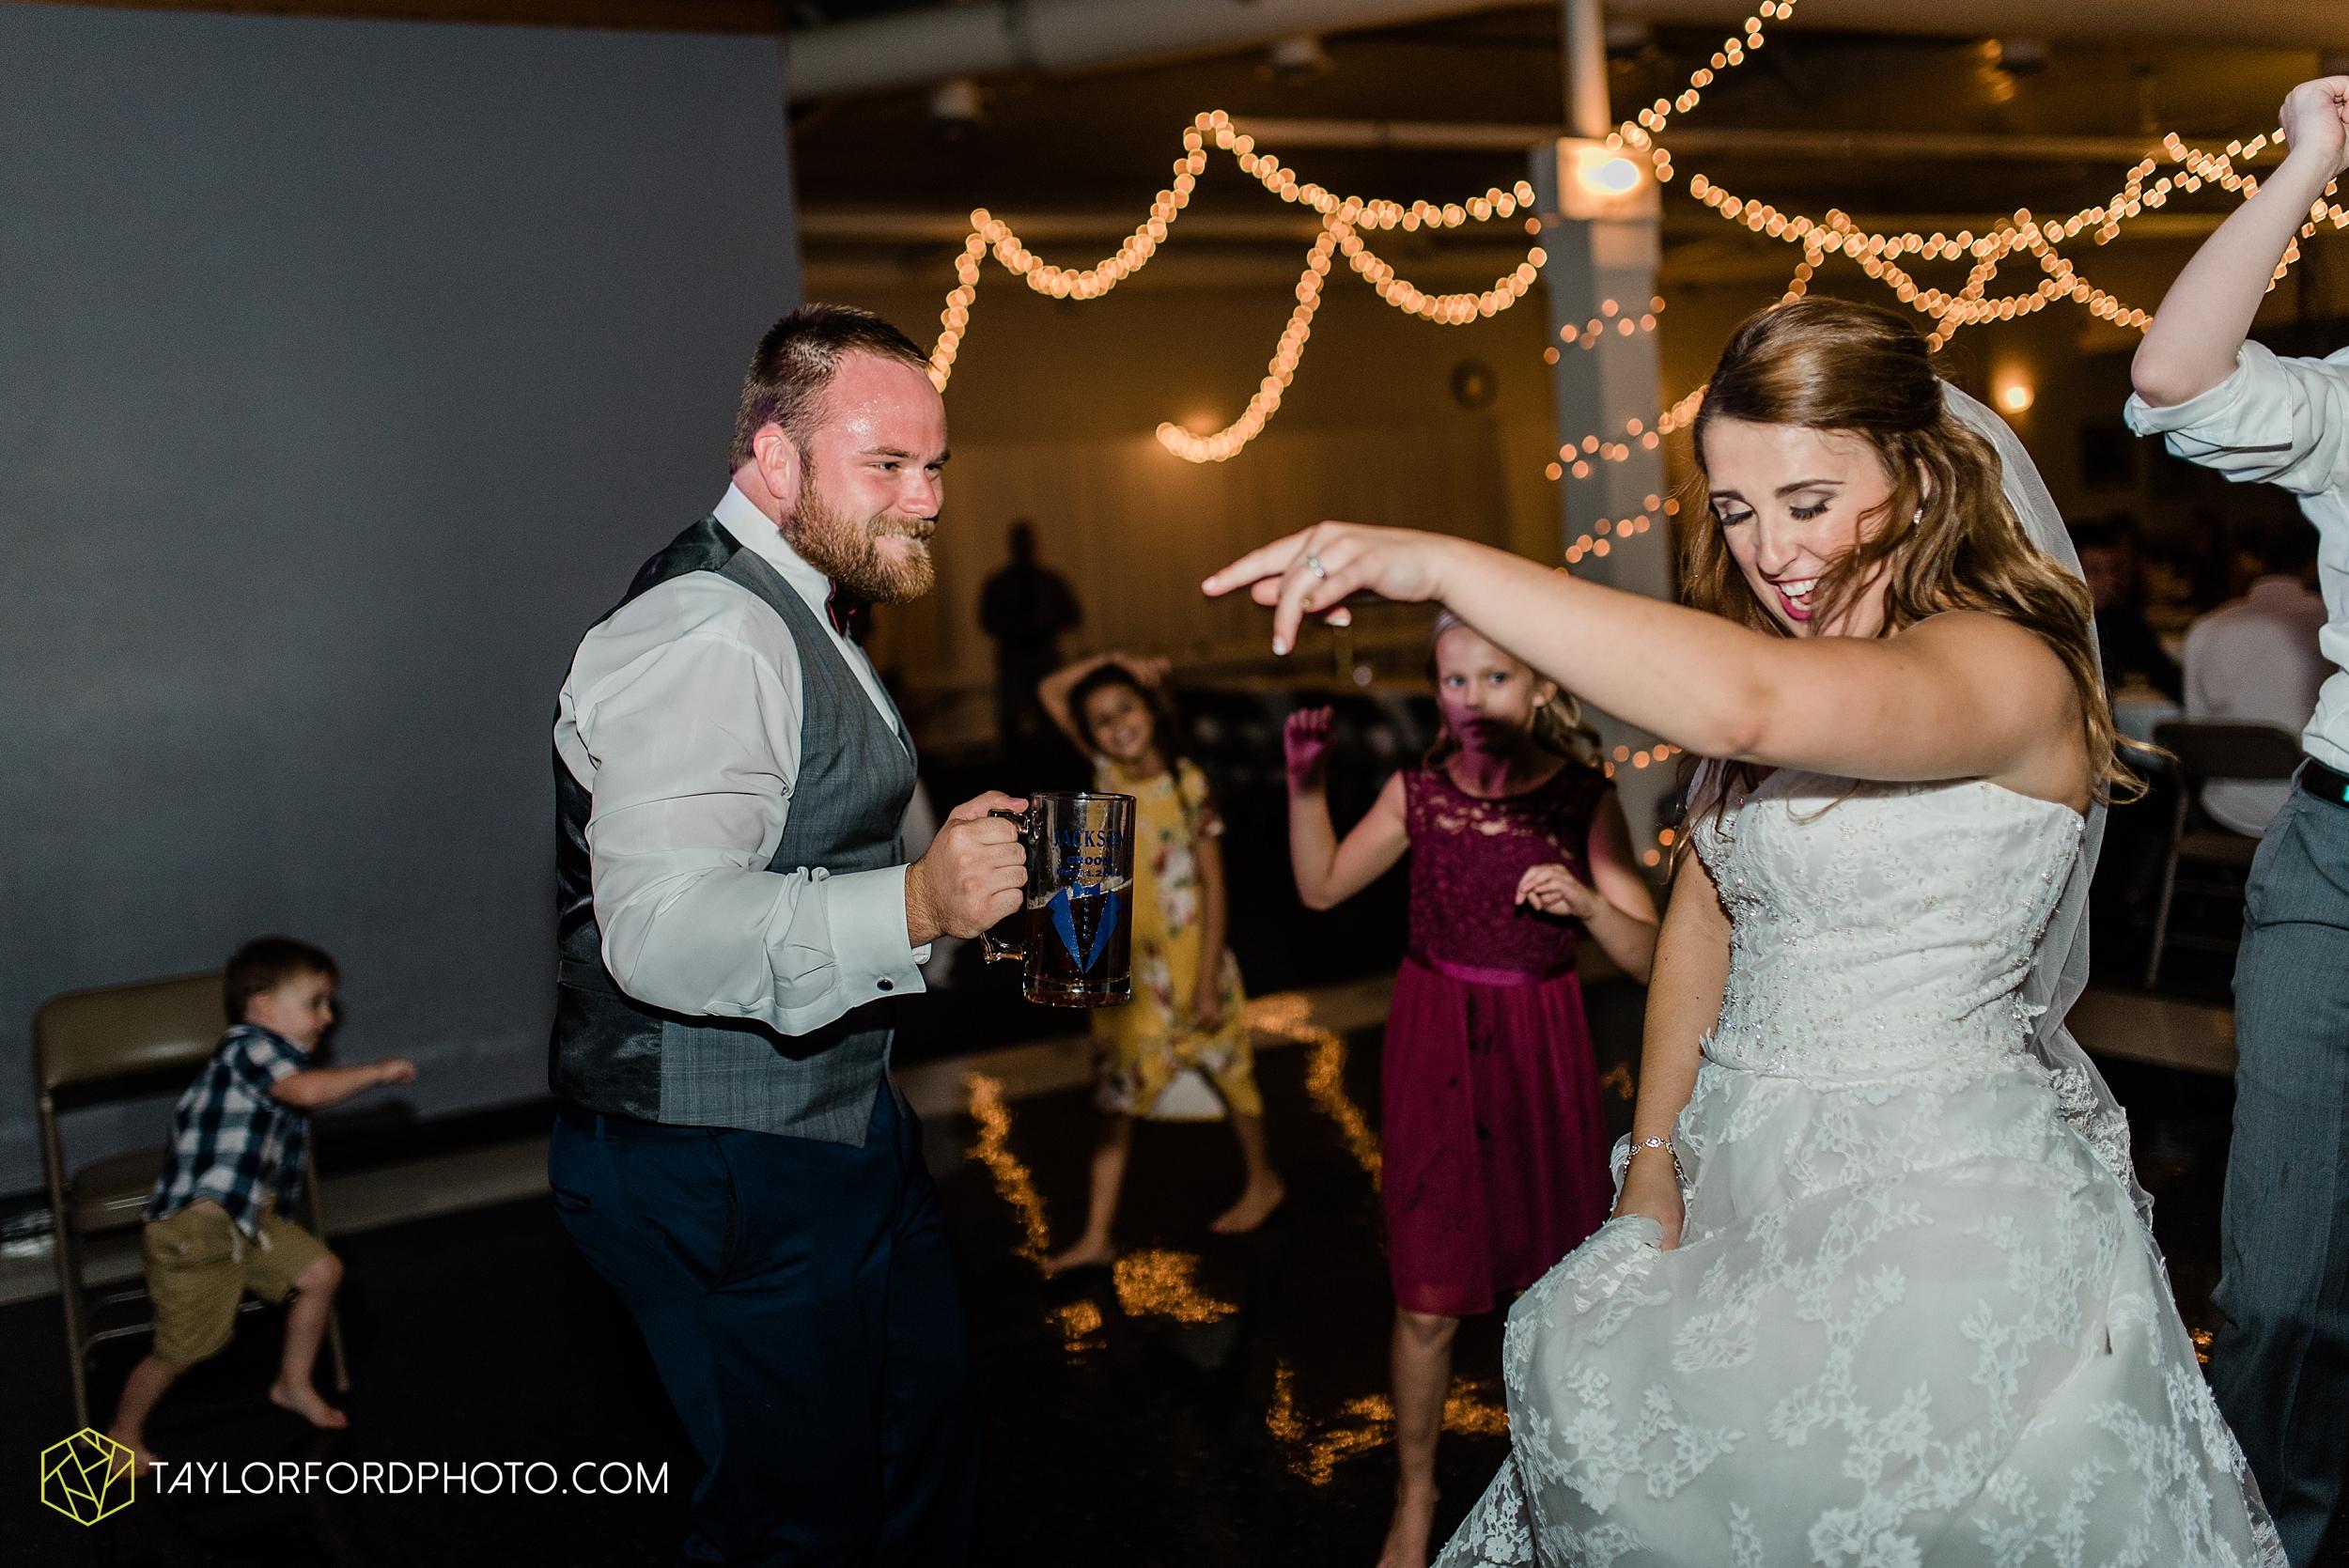 chelsey-zosh-jackson-young-first-united-methodist-church-senior-center-van-wert-ohio-wedding-photographer-taylor-ford-photography_0107.jpg